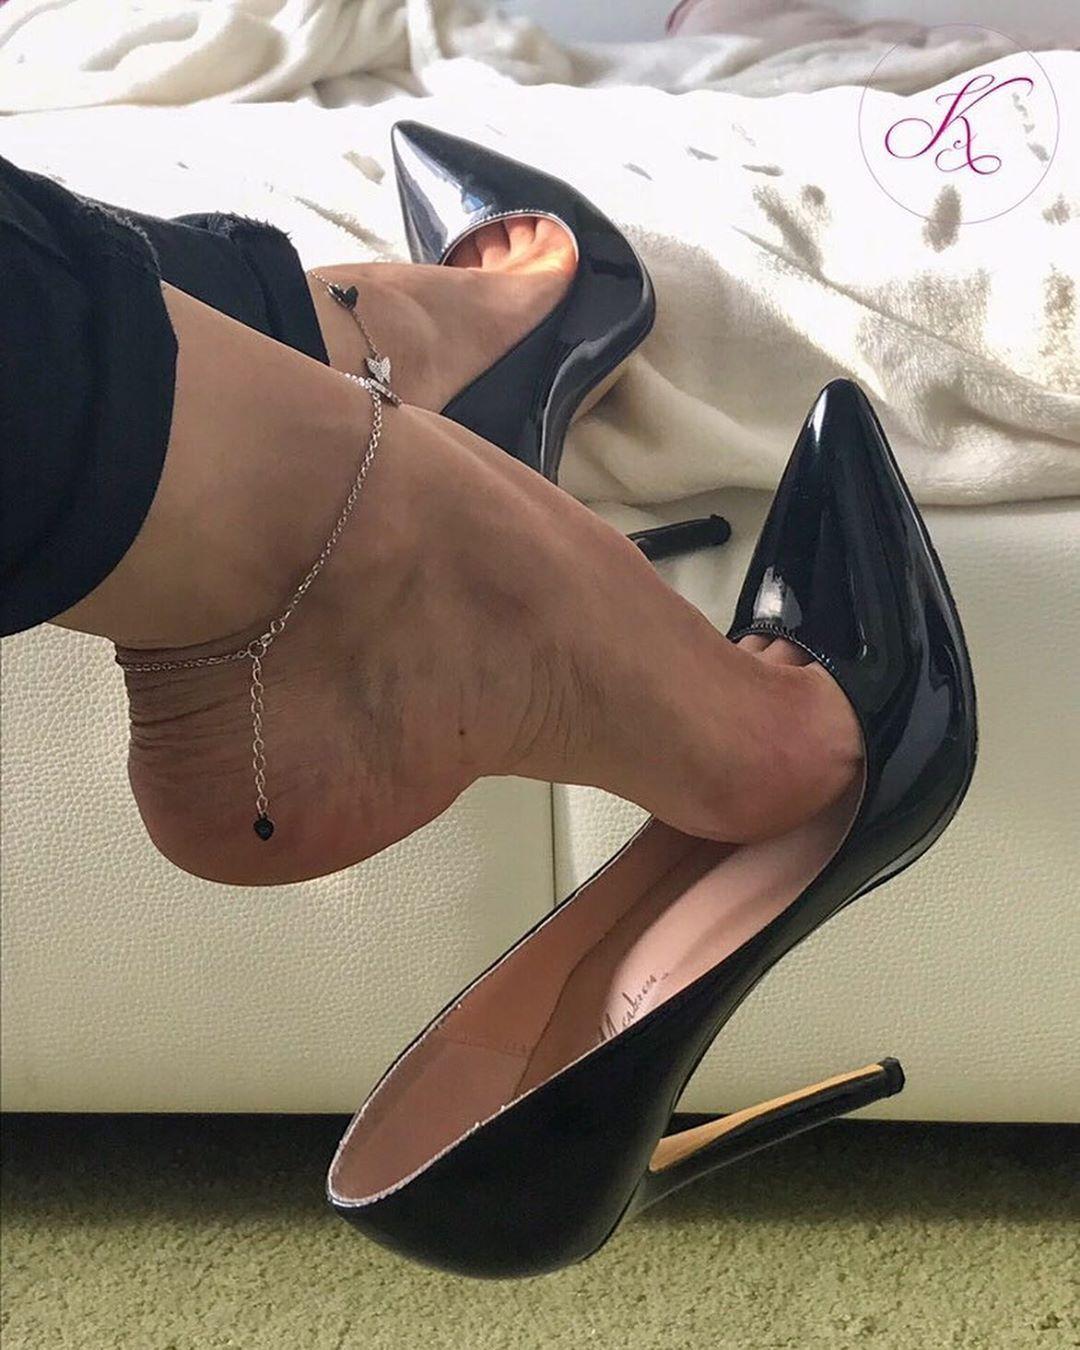 𝓒𝓵𝓪𝓼𝓼𝔂 𝓦𝓸𝓶𝓪𝓷 Kat Feet Happysunday Chillin Blackheels Pumps Stilettos Tacchi Shoefie Heeladdict Pantyhose Heels Heels Stiletto Heels